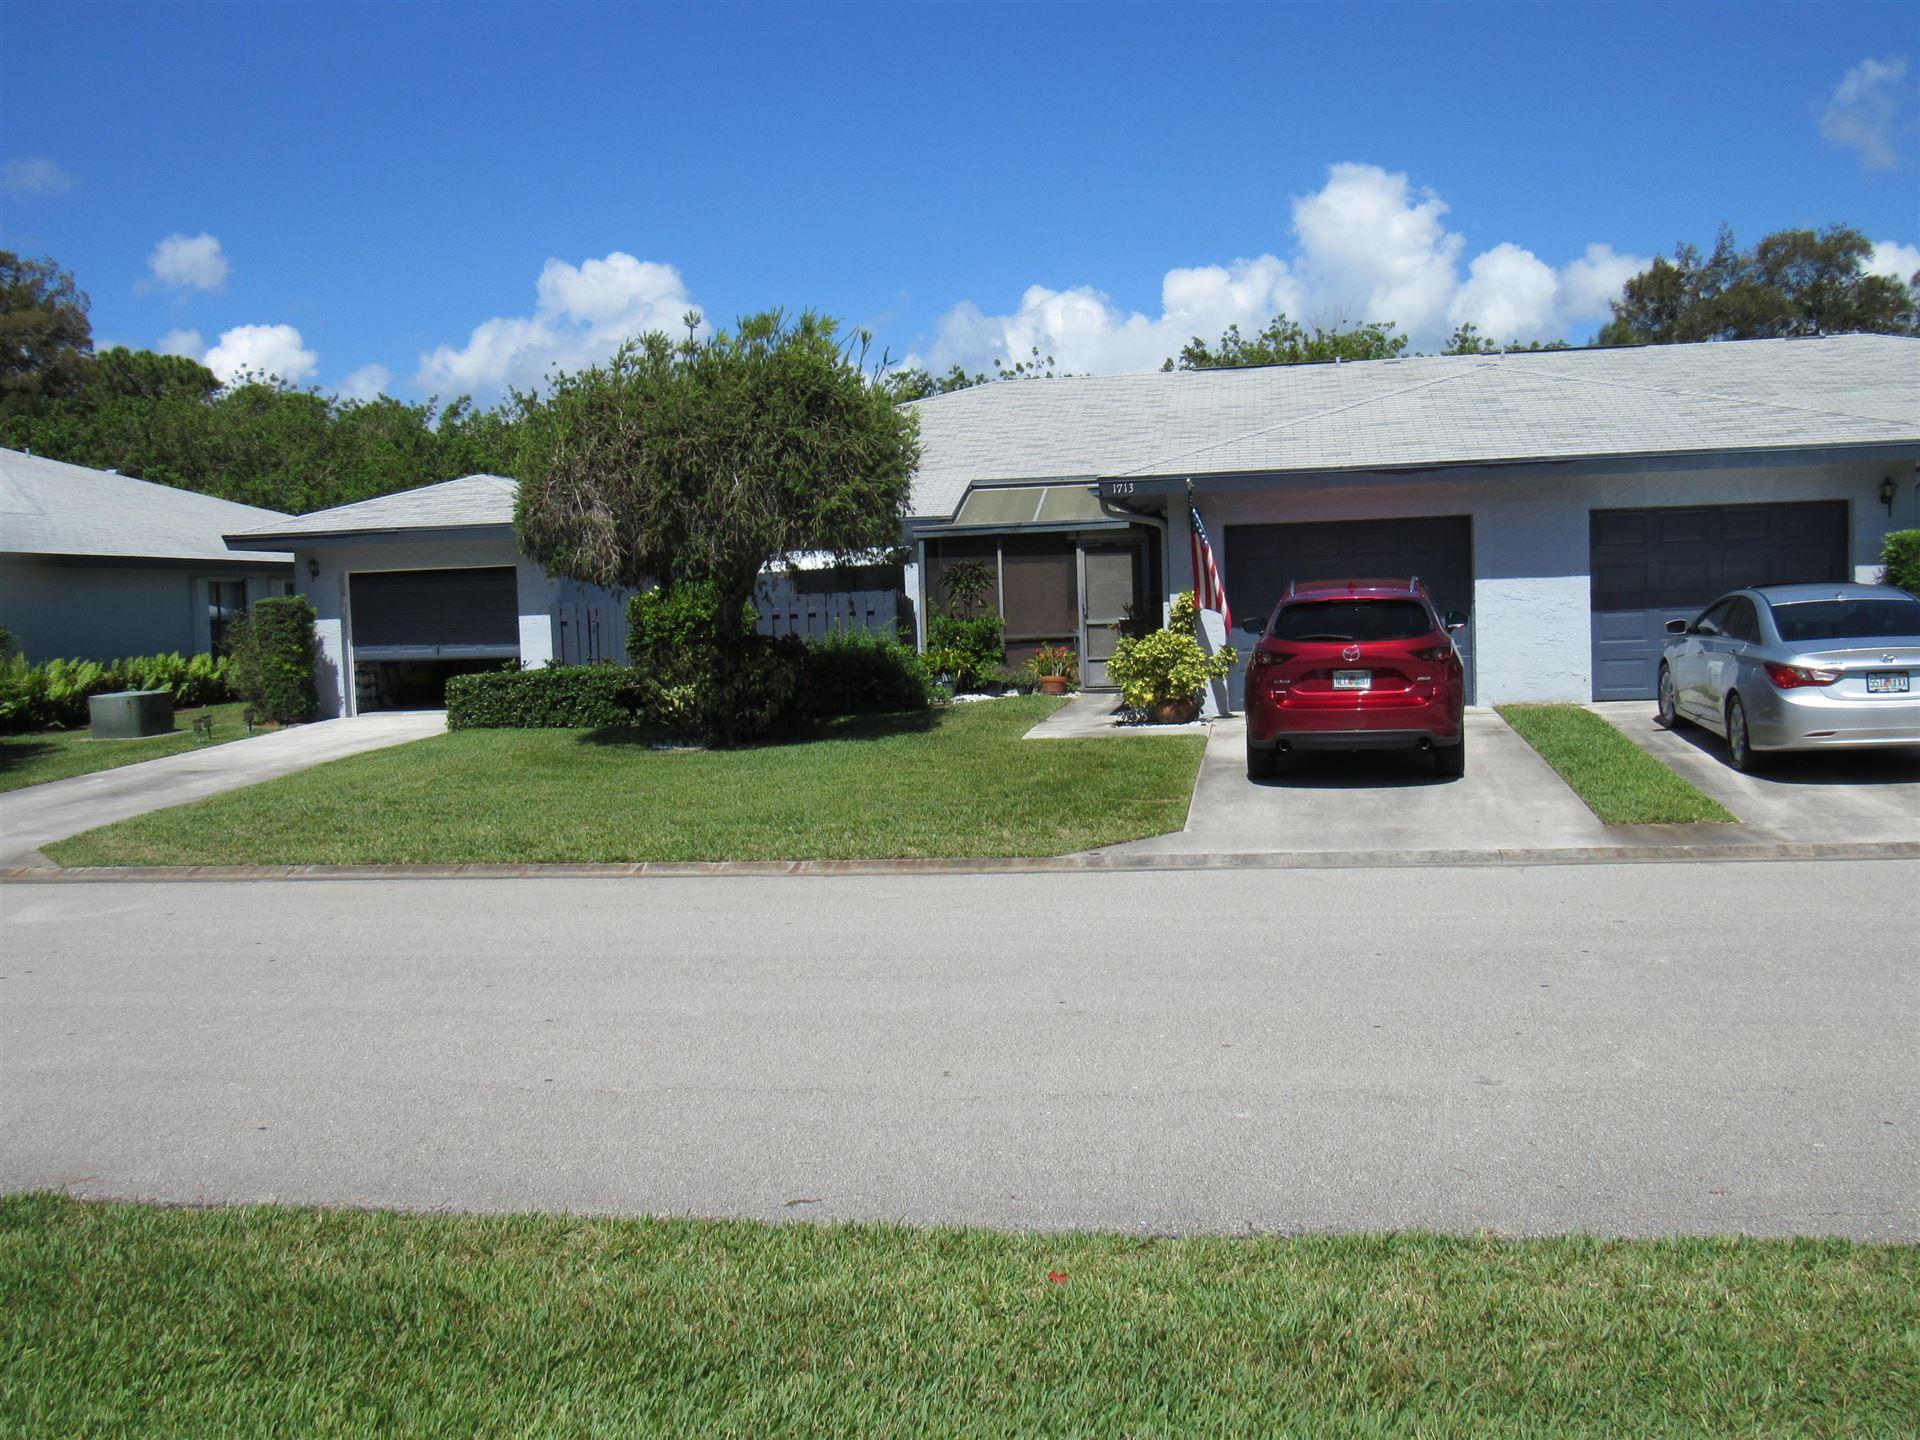 1713 W W Royal Tern Lane, Fort Pierce, FL 34982 - MLS#: RX-10723279